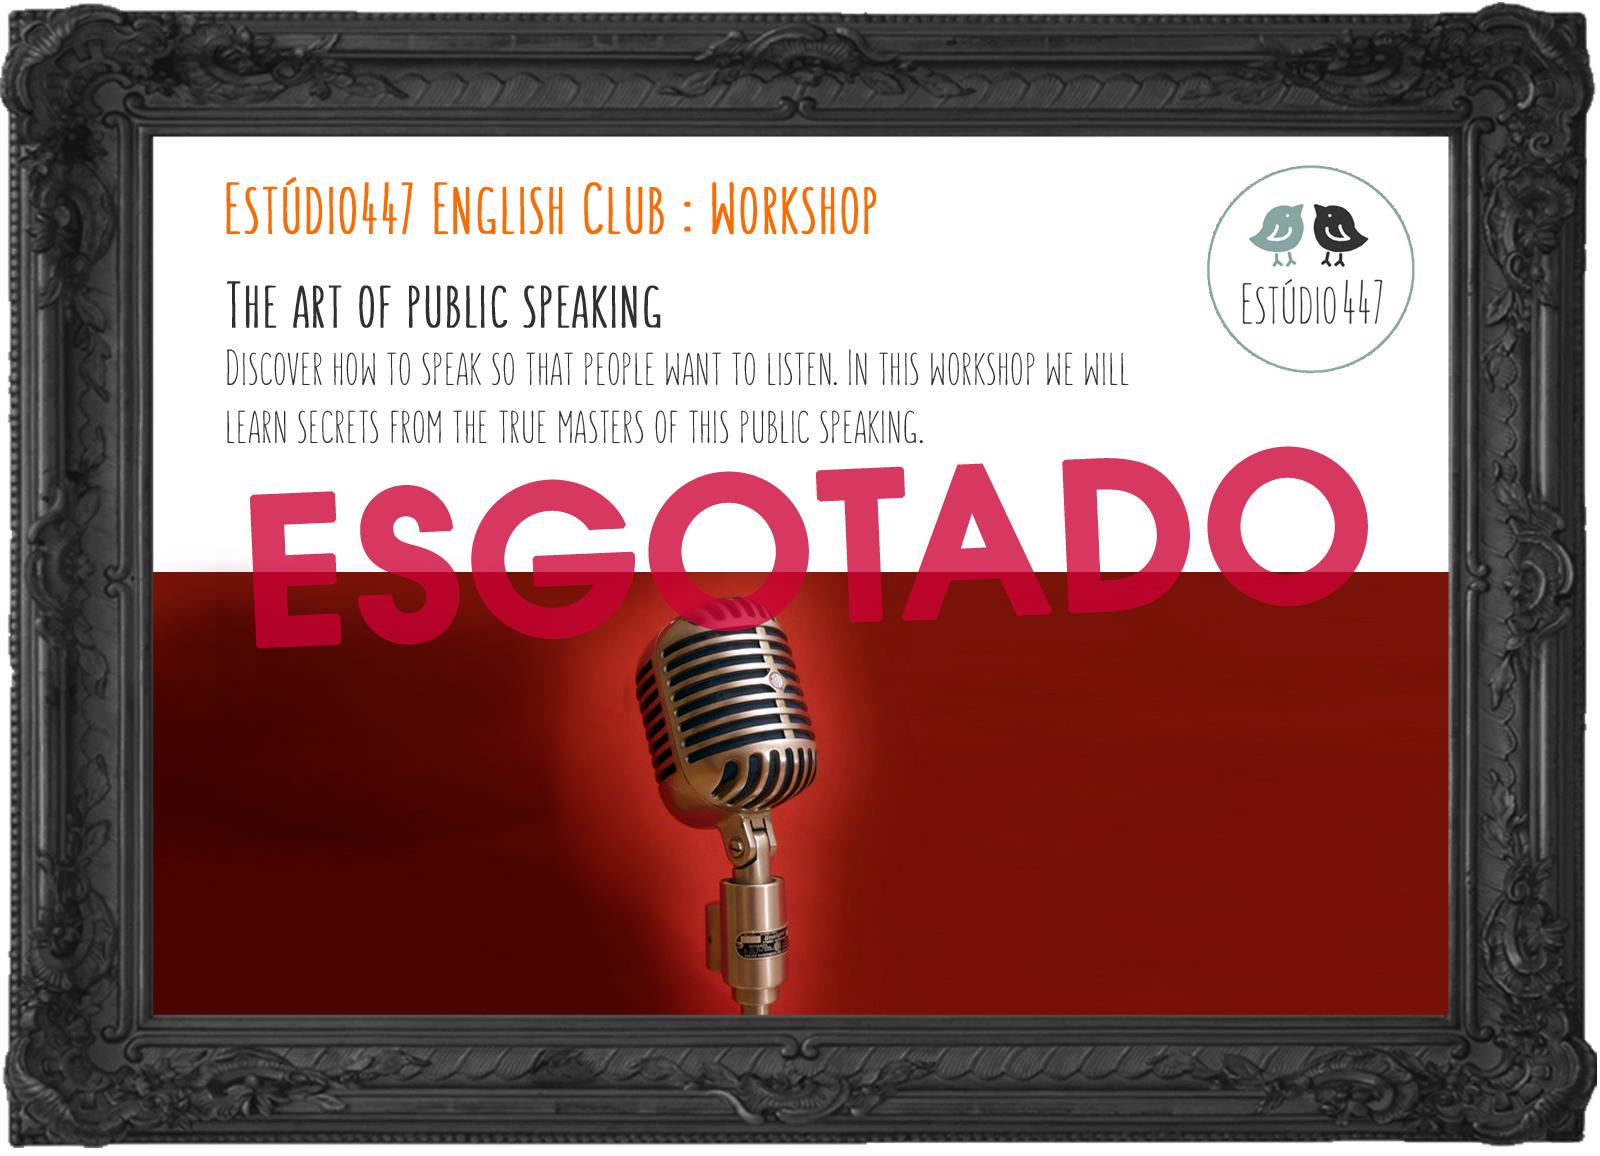 Estúdio447 Coworking Moema & English Club - The art of public speaking